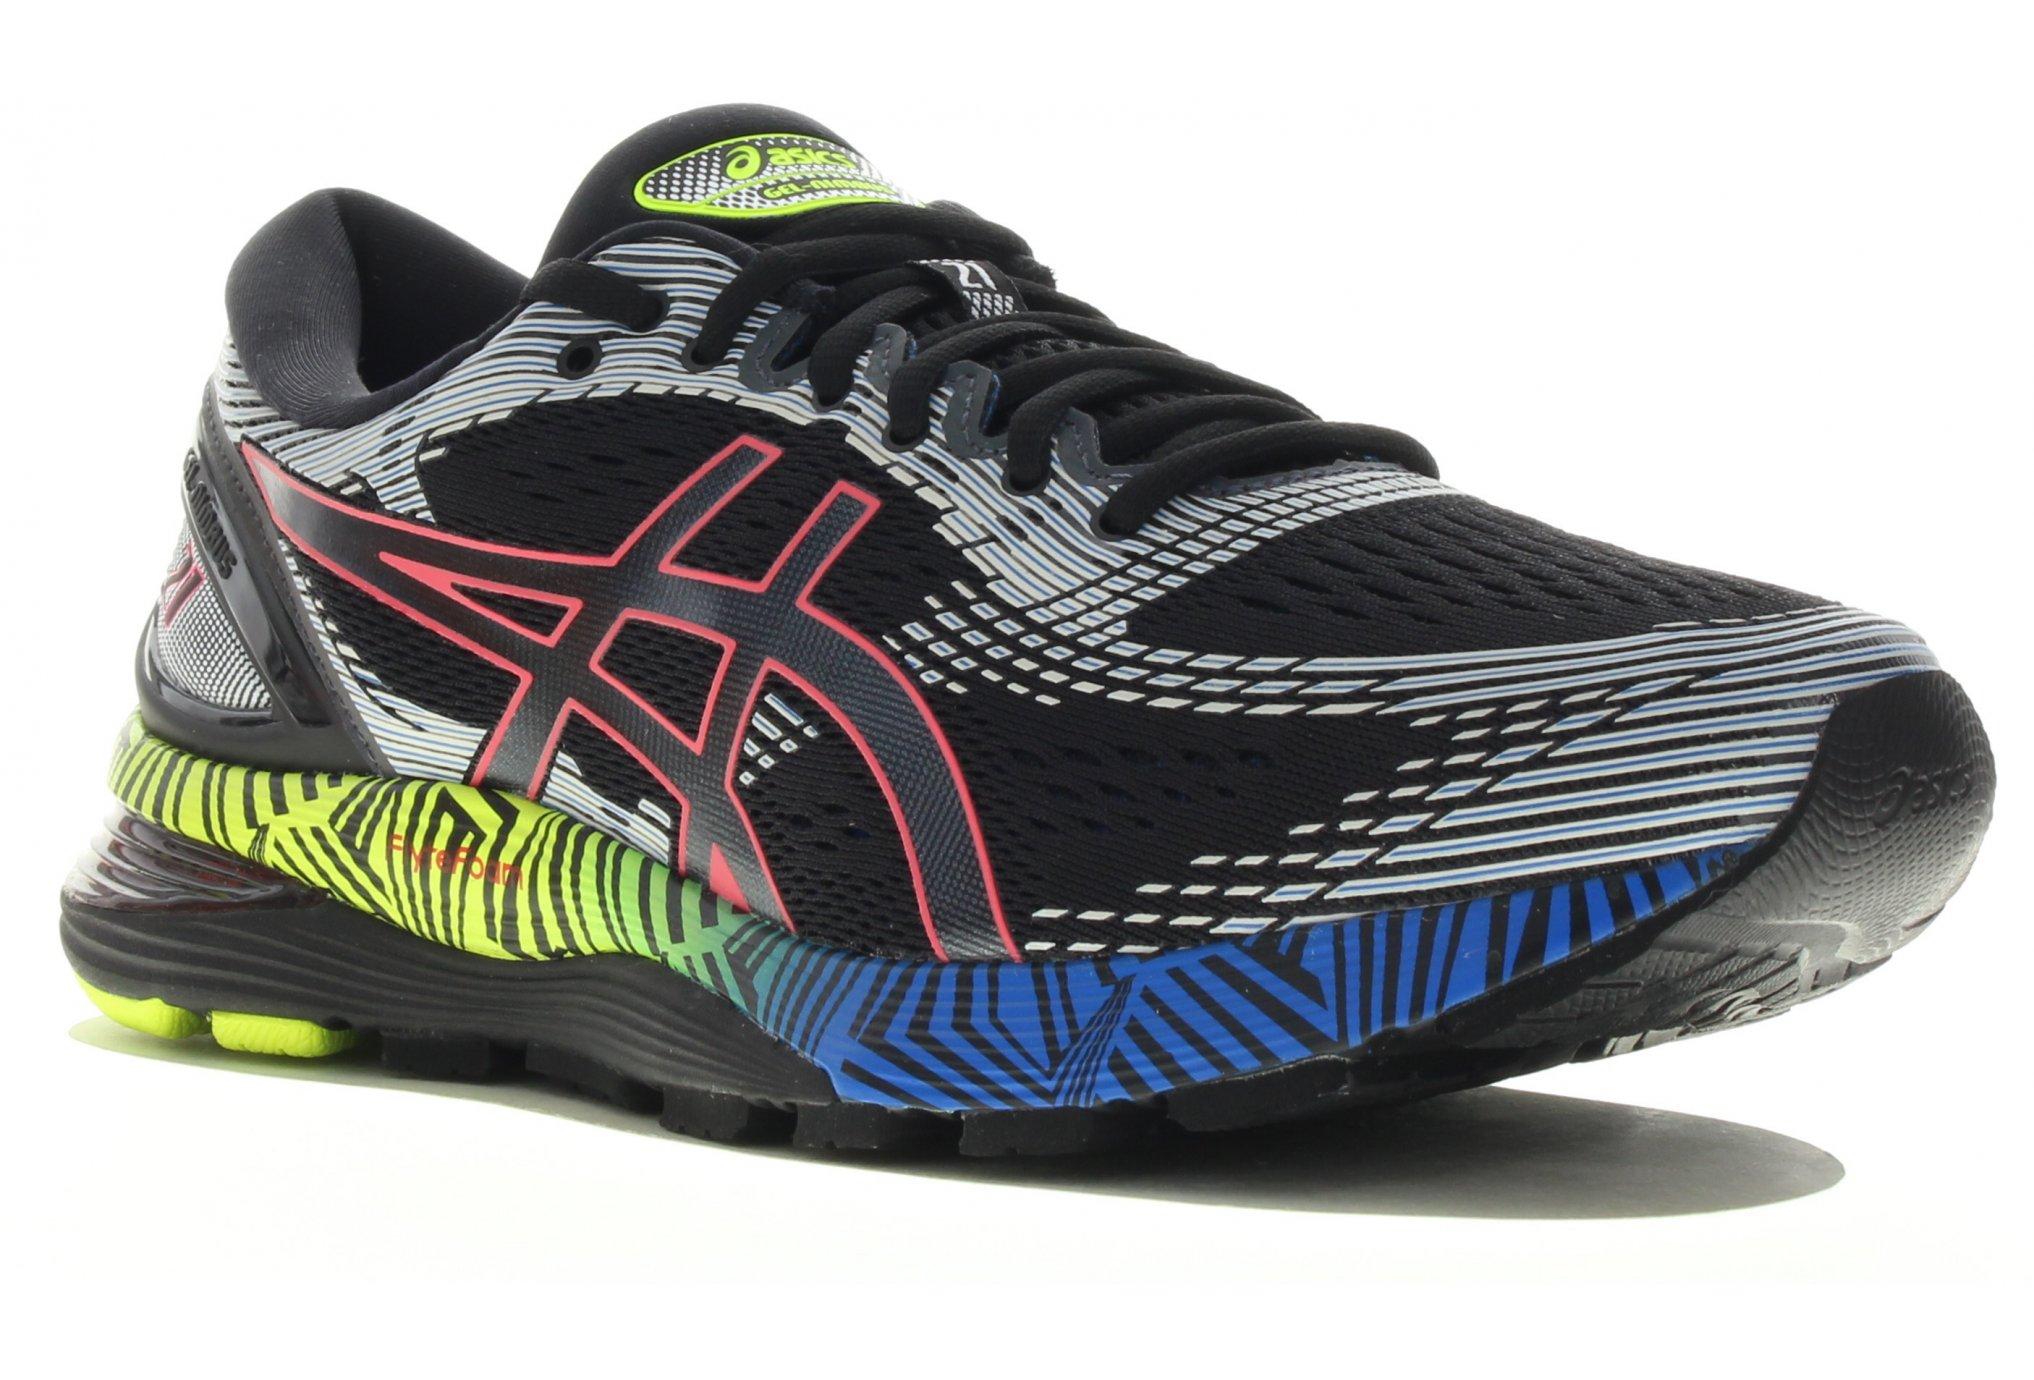 Asics Gel-Nimbus 21 Expert Chaussures homme